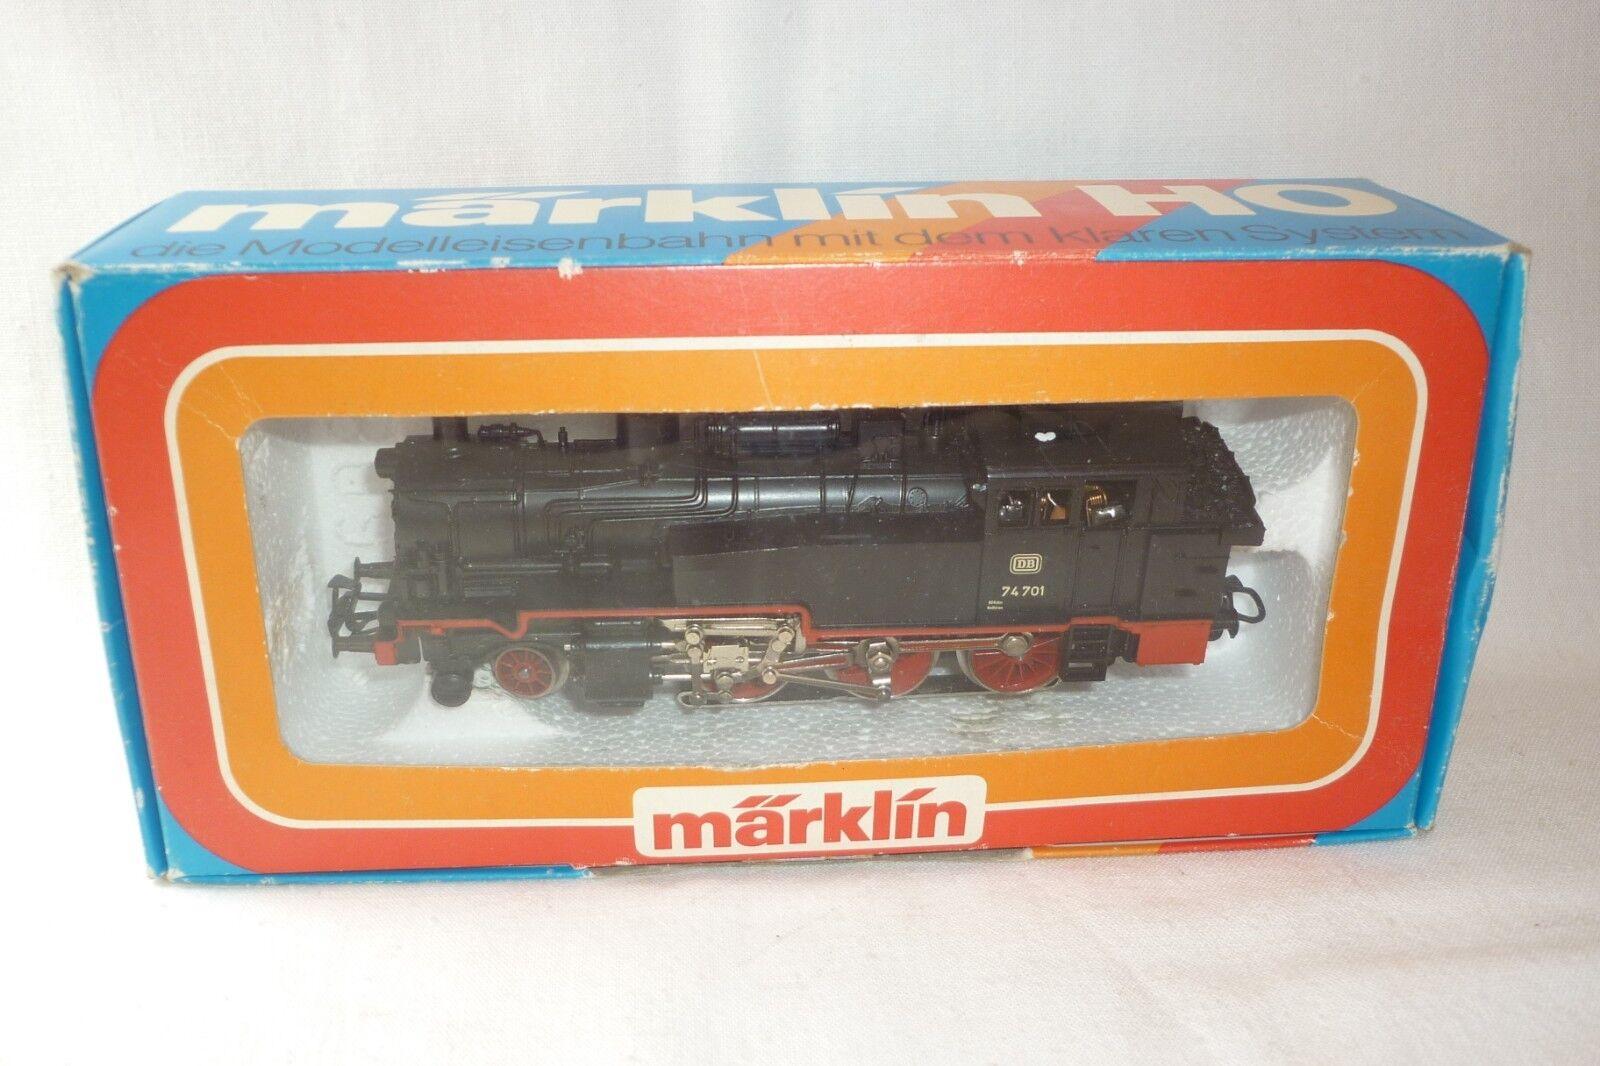 Märklin-traccia h0 - 3095 a vapore locomotiva DB 74 701-SCATOLA ORIGINALE (8.ei-141)